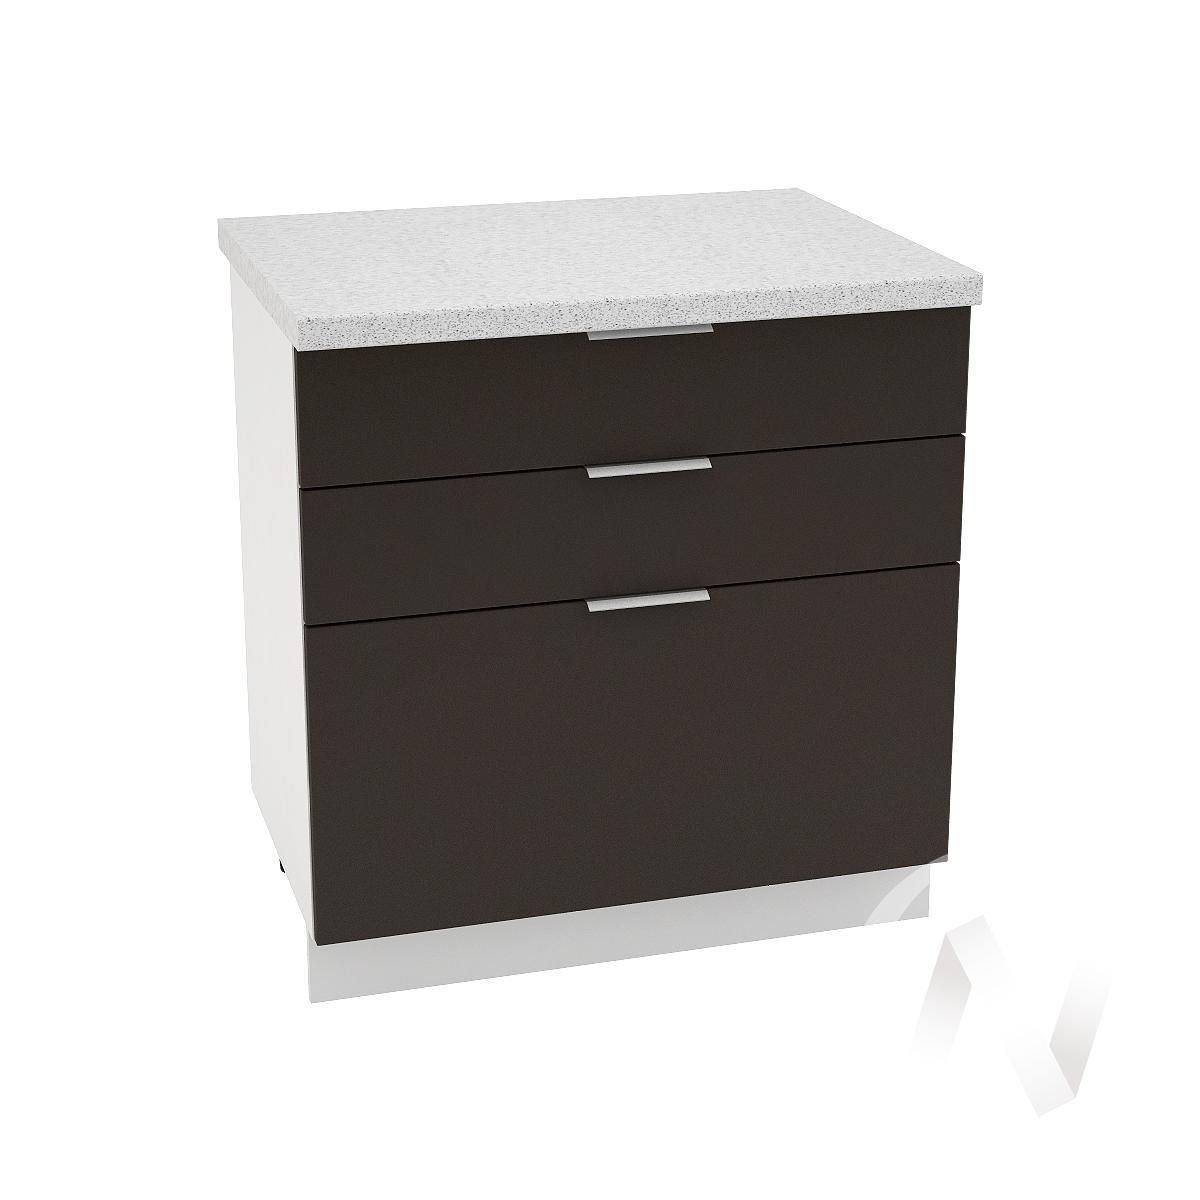 "Кухня ""Терра"": Шкаф нижний с 3-мя ящиками 800, ШН3Я 800 (смоки софт/корпус белый)"